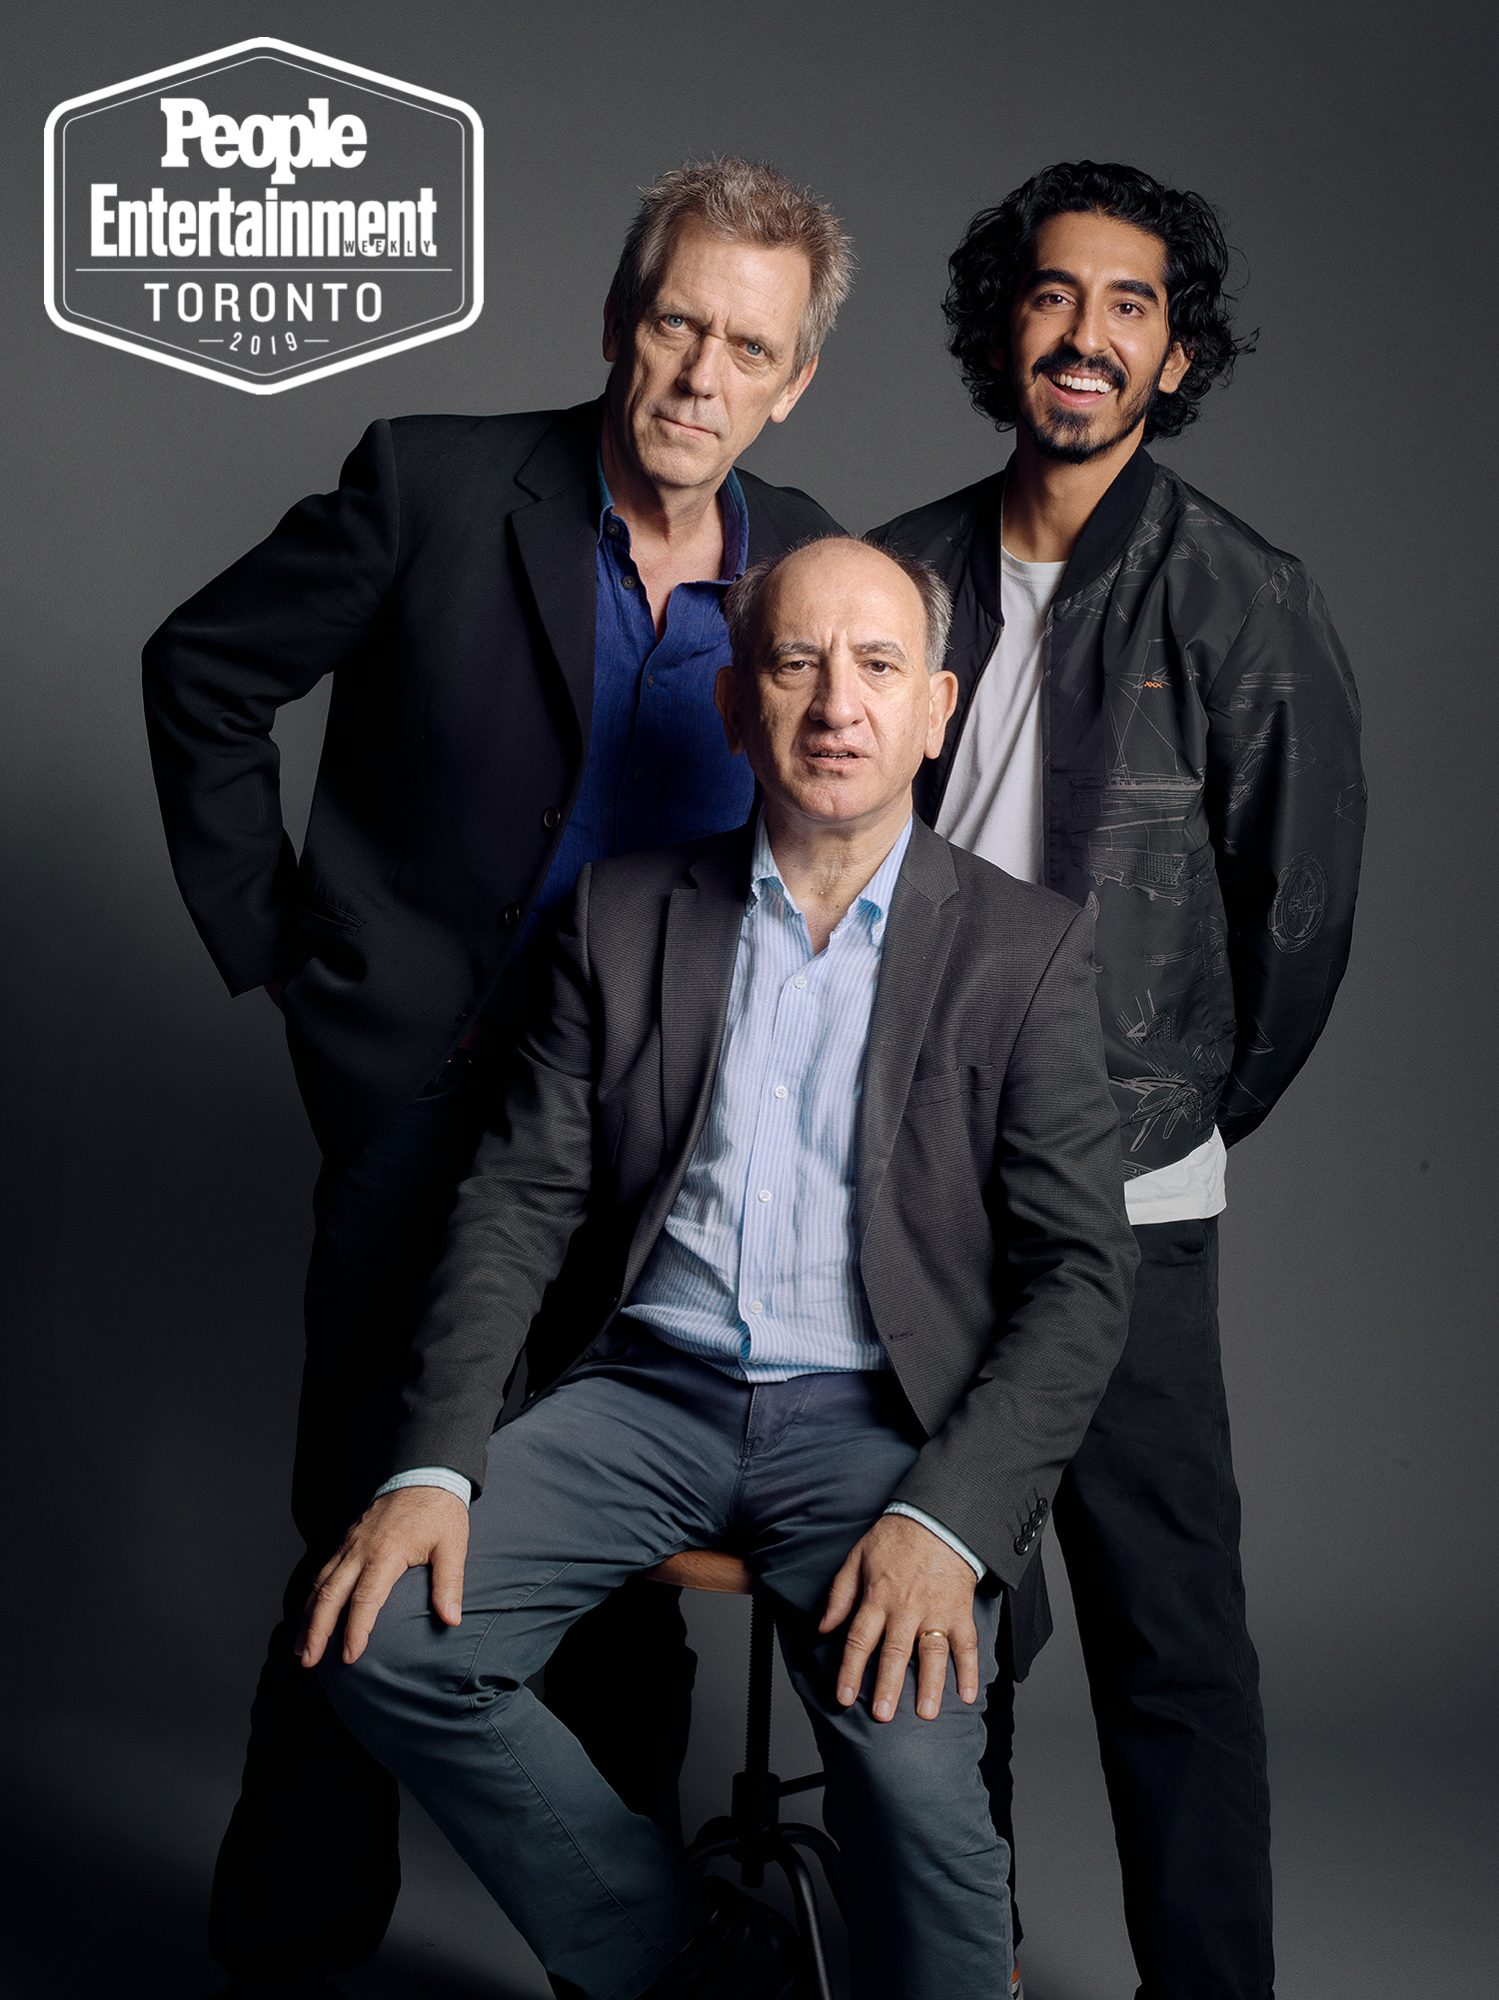 Hugh Laurie, Dev Patel, and Armando Iannucci